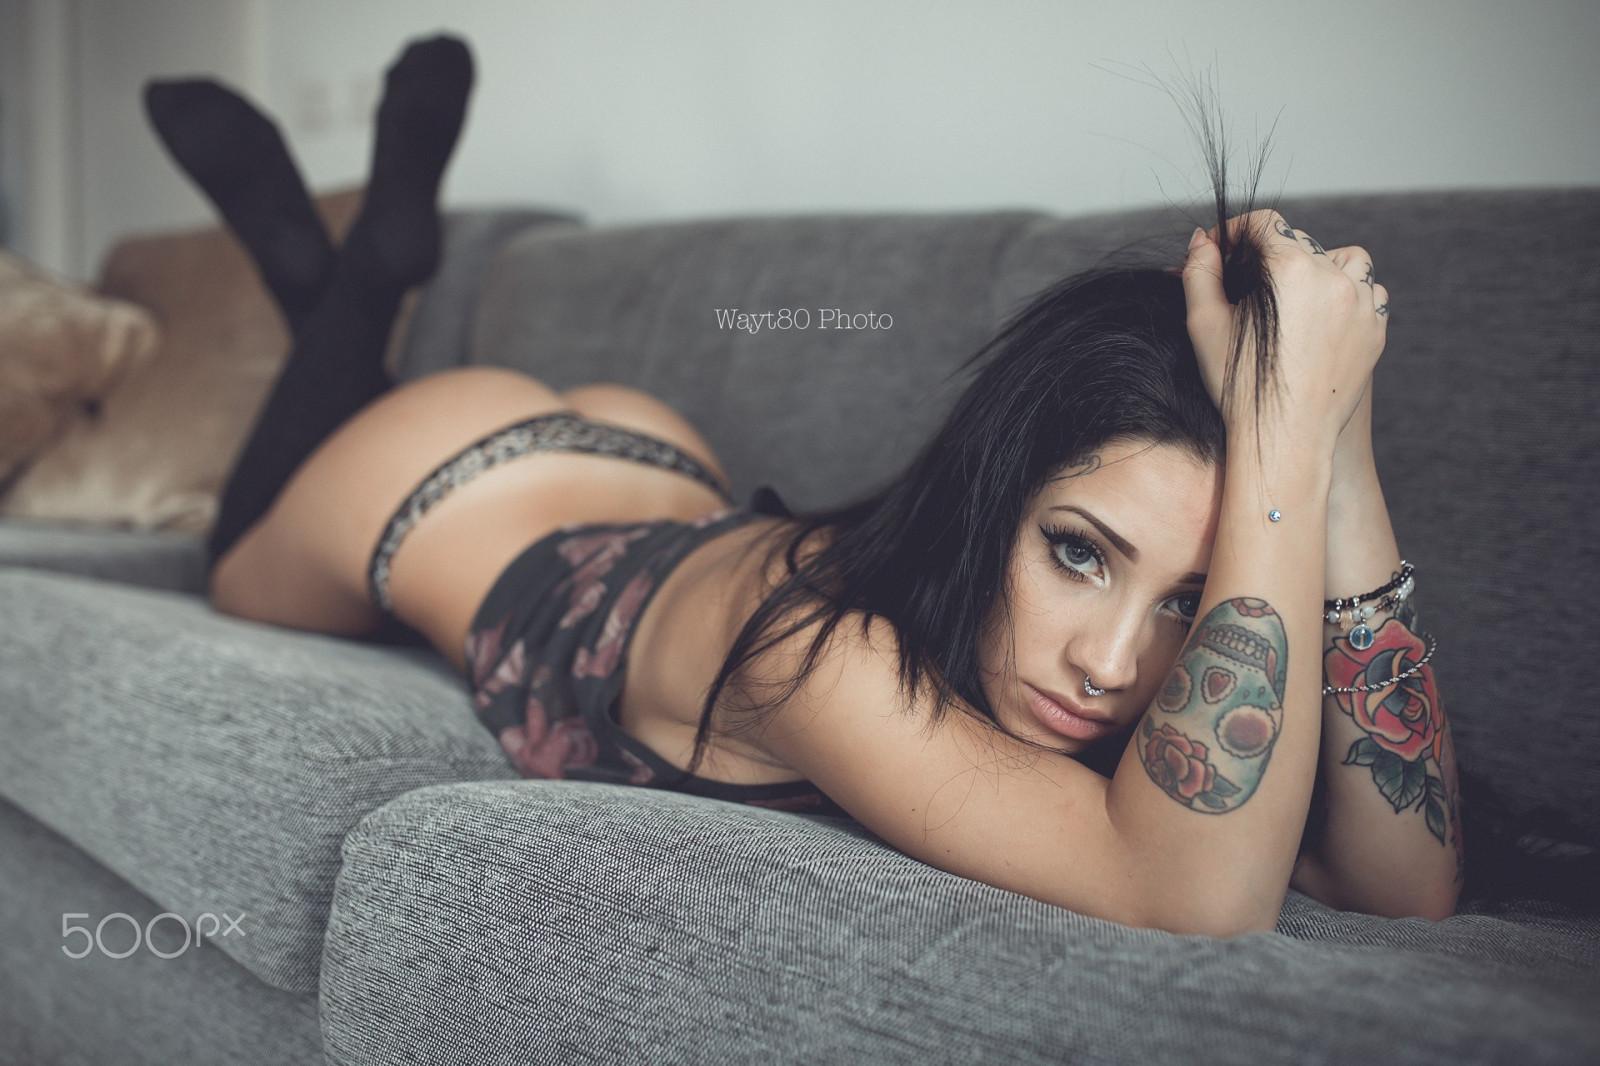 Skinny anal gape